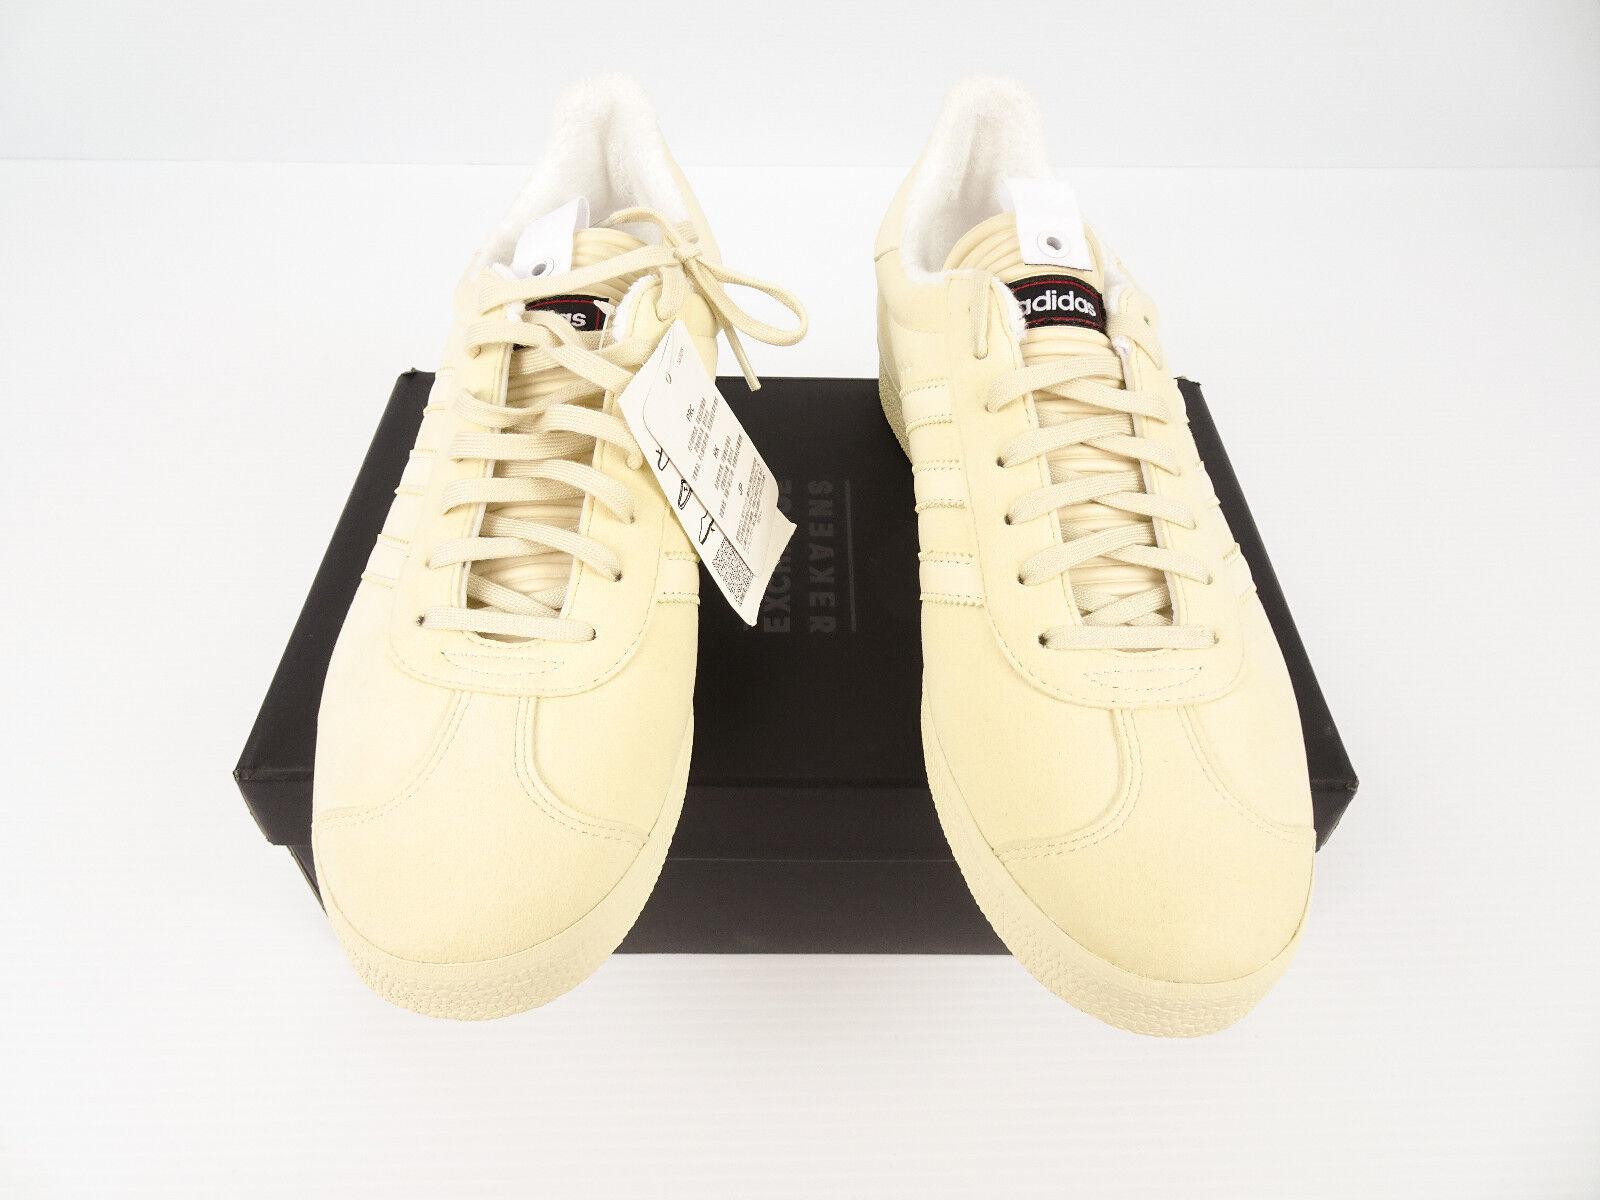 adidas Consortium x United Arrows & Sons x Slam Jam Gazelle Turnschuhe 11 NIB